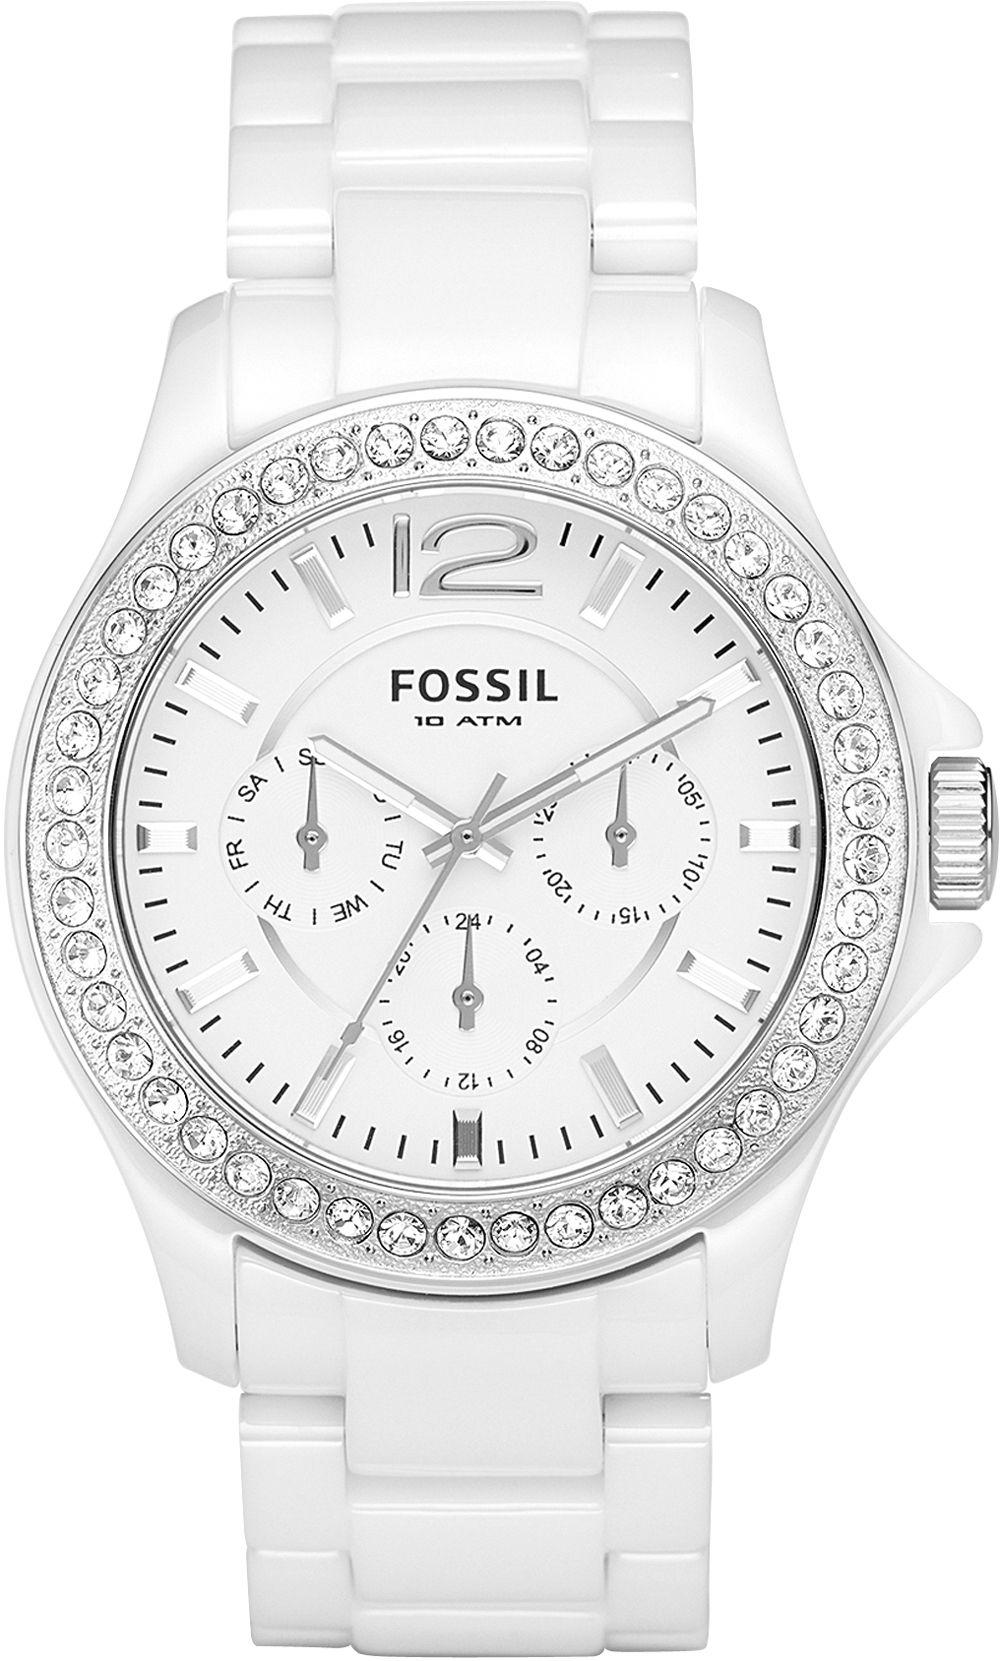 Fossil Women S Ce1010 White Ceramic Bracelet White Glitz Analog Dial Multifunction Watch Fossil Watches Women Fossil Watches For Men White Watches For Men